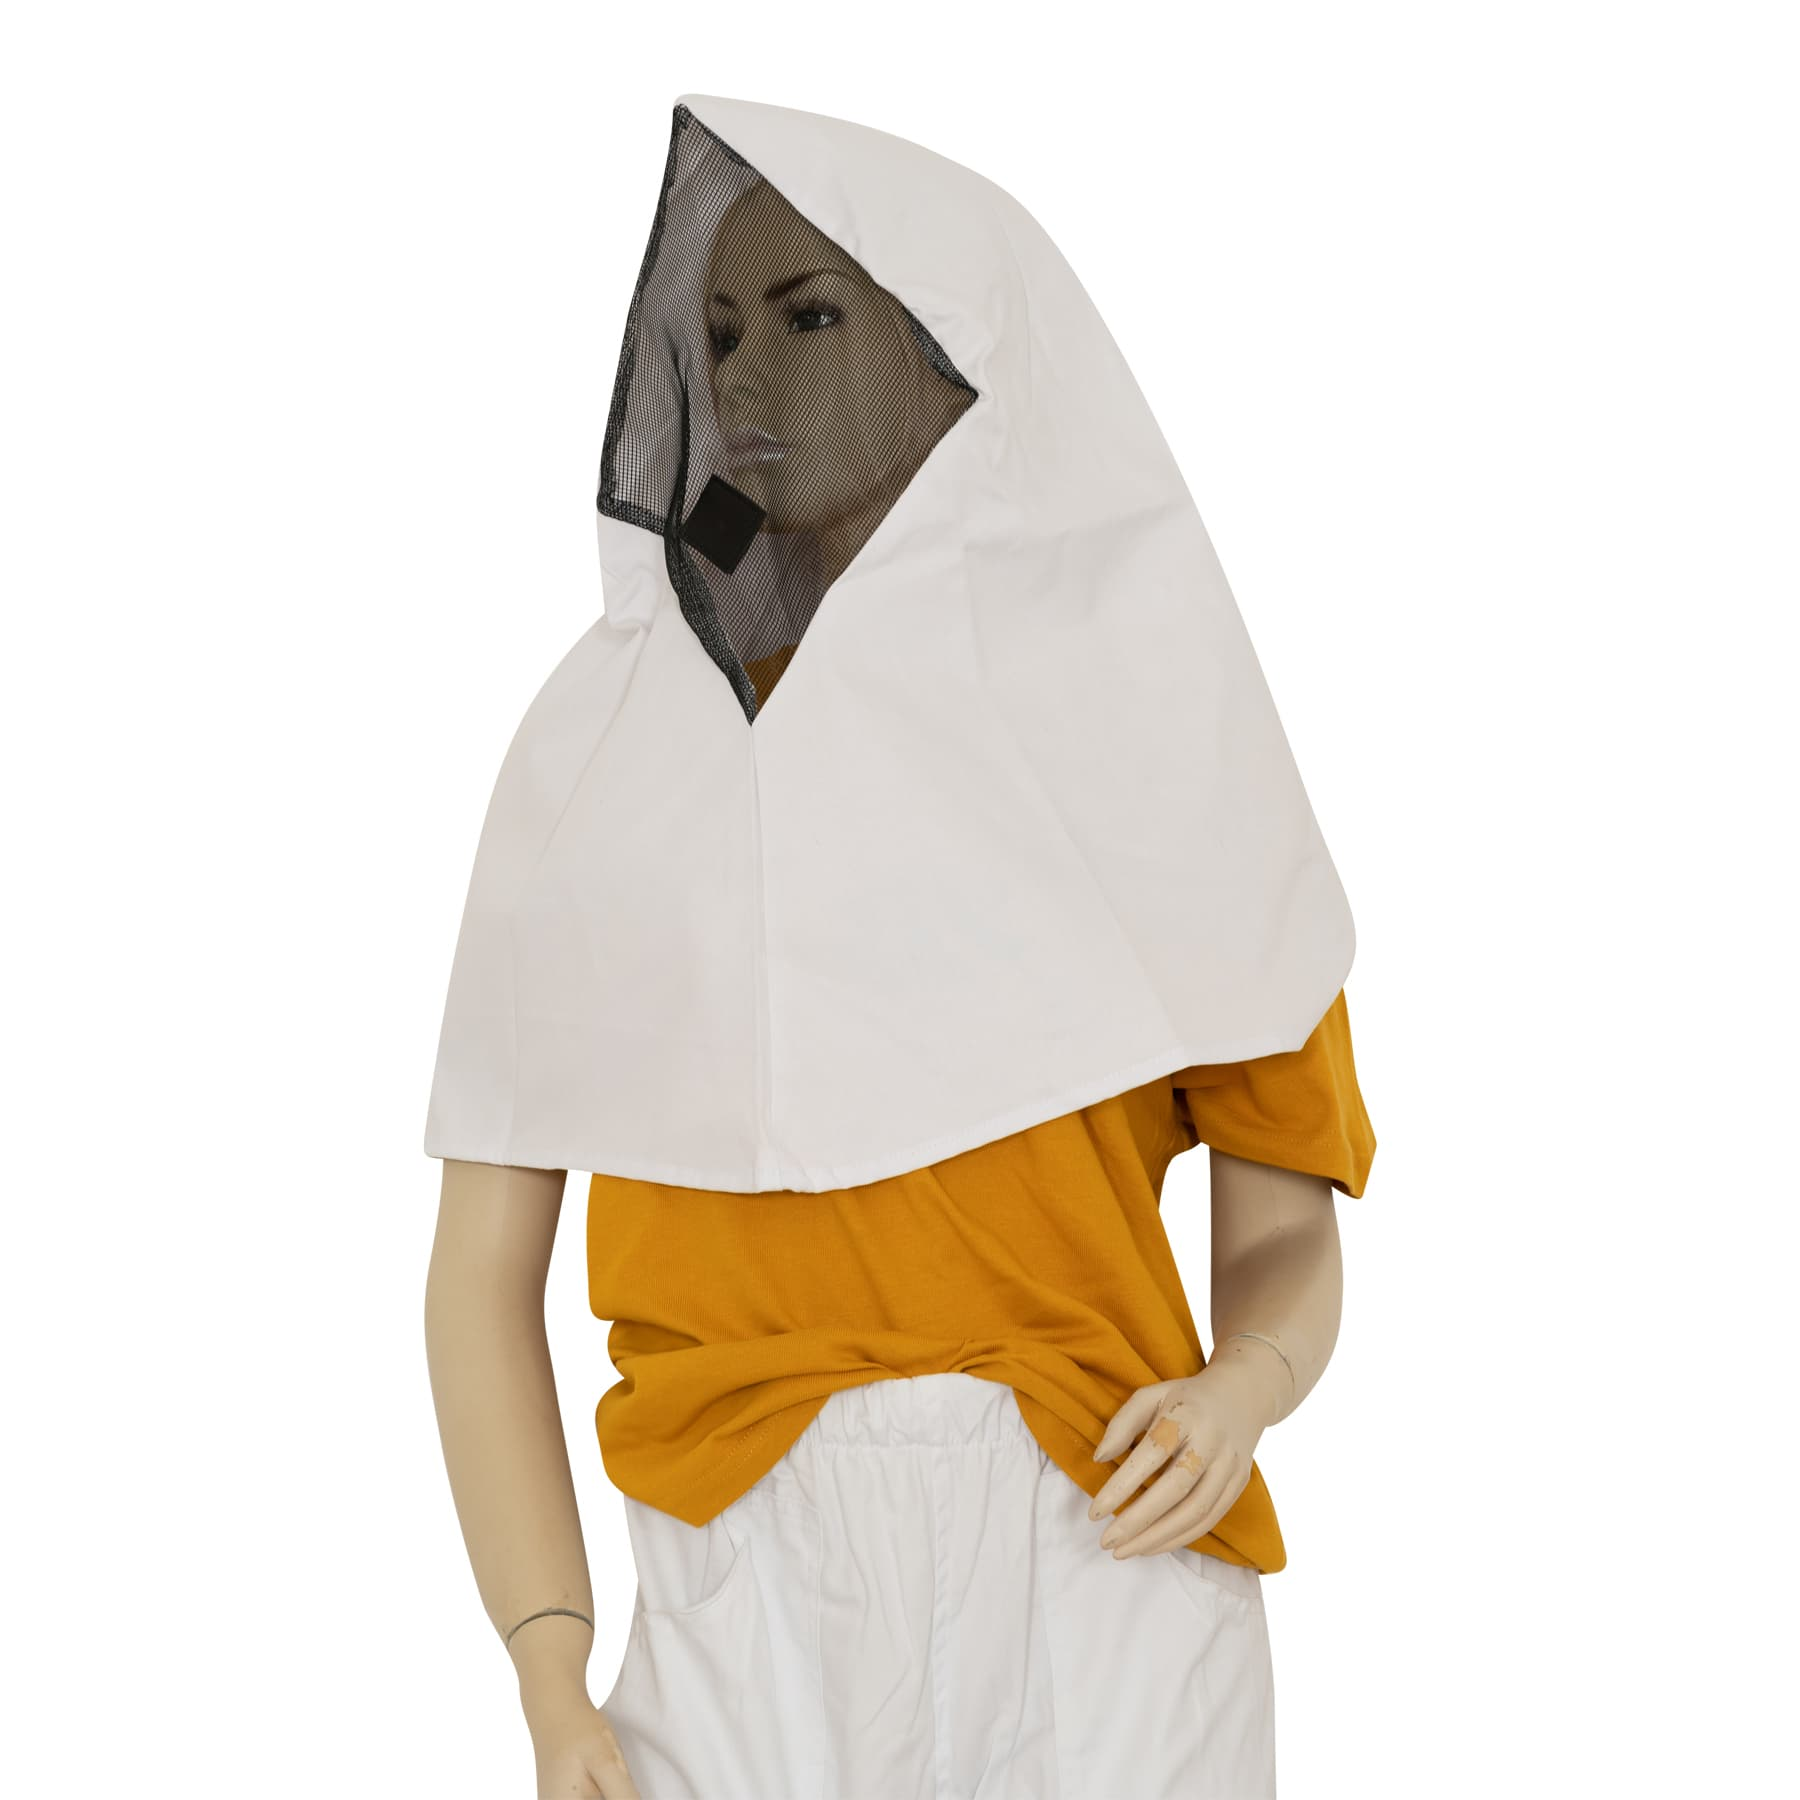 Imkerhaube, rautenförmig, auch Mönchhaube genannt